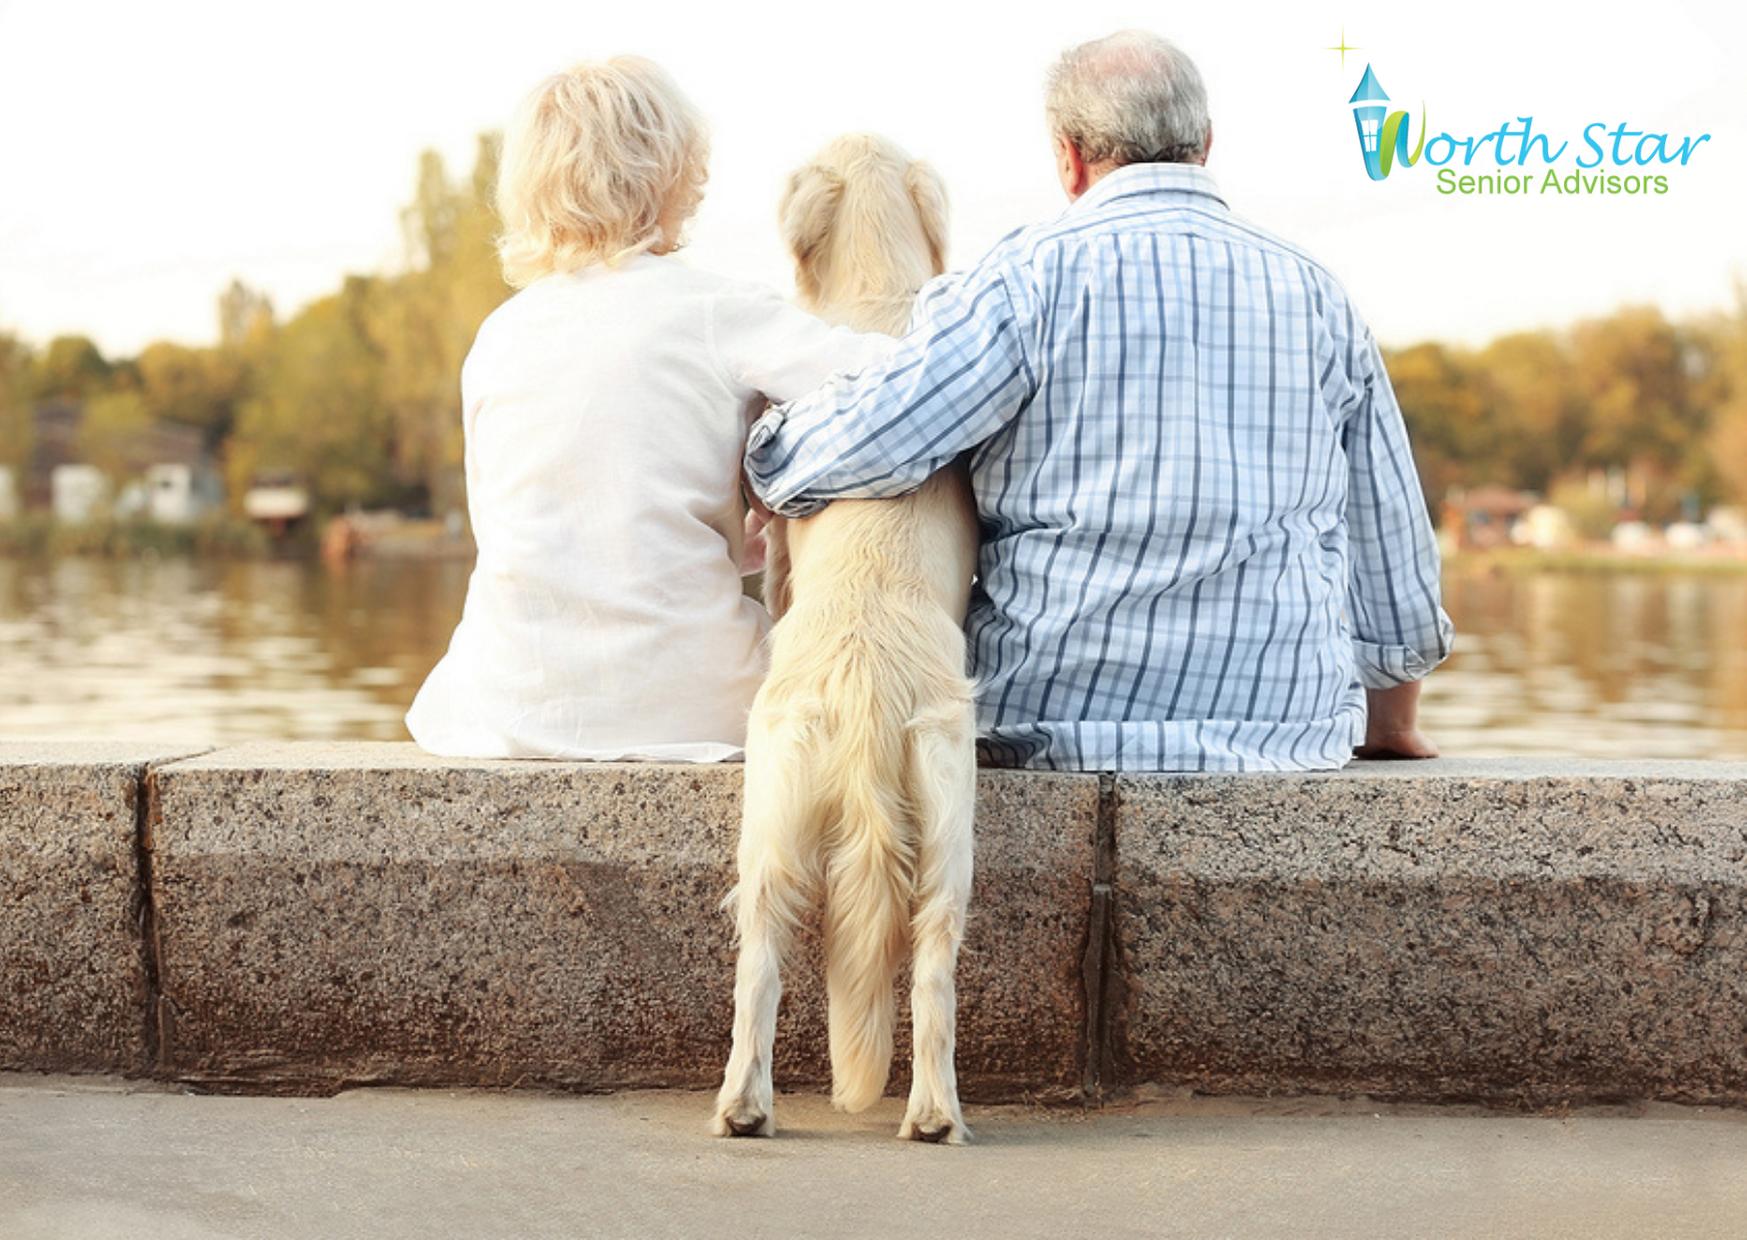 Pet-therapy-north-star-senior-advisors